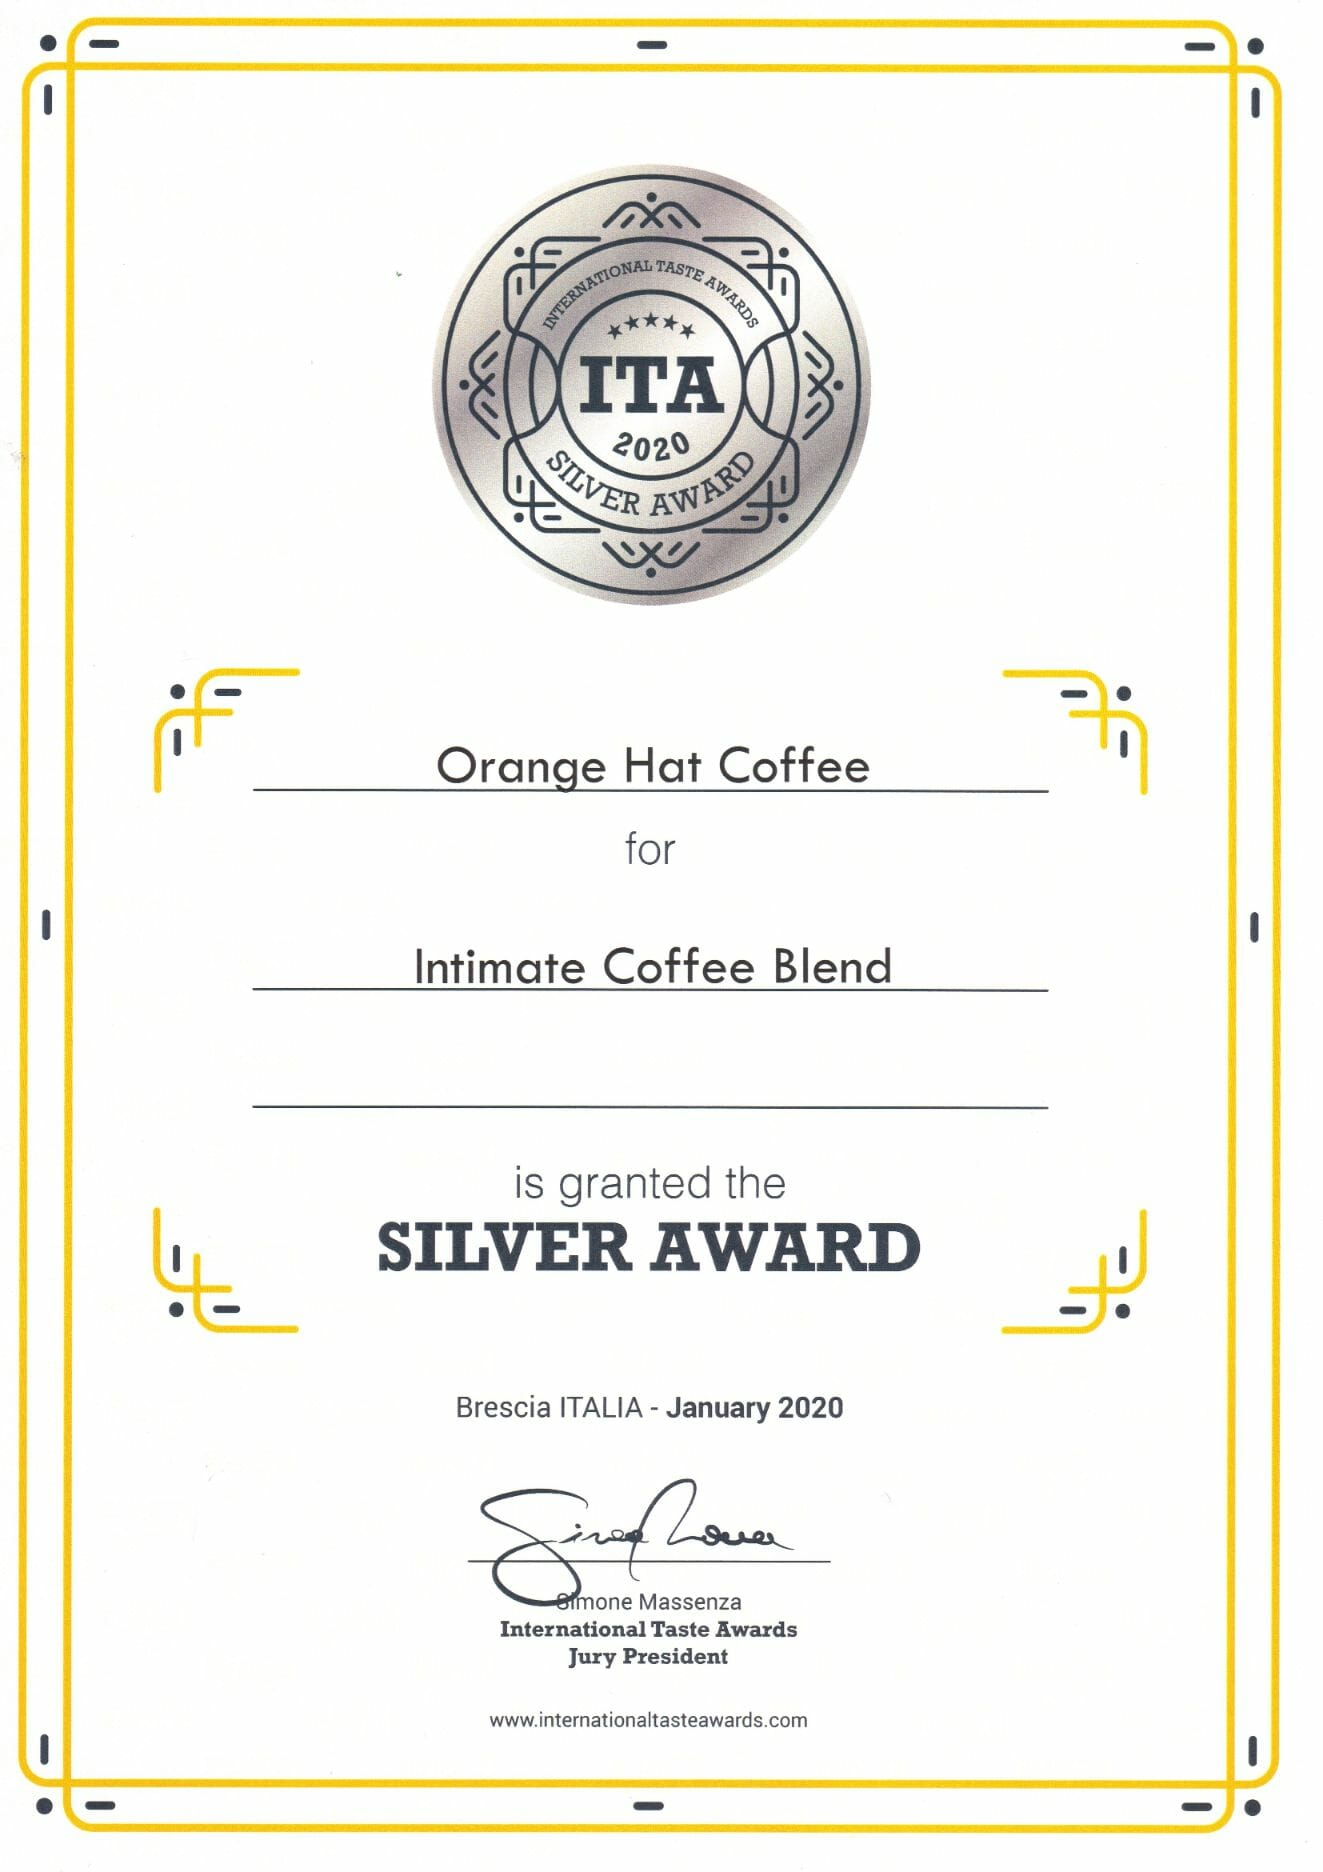 Orange Hat Coffee - International Taste Awards 2020 abalvošanas pasākumā! 8